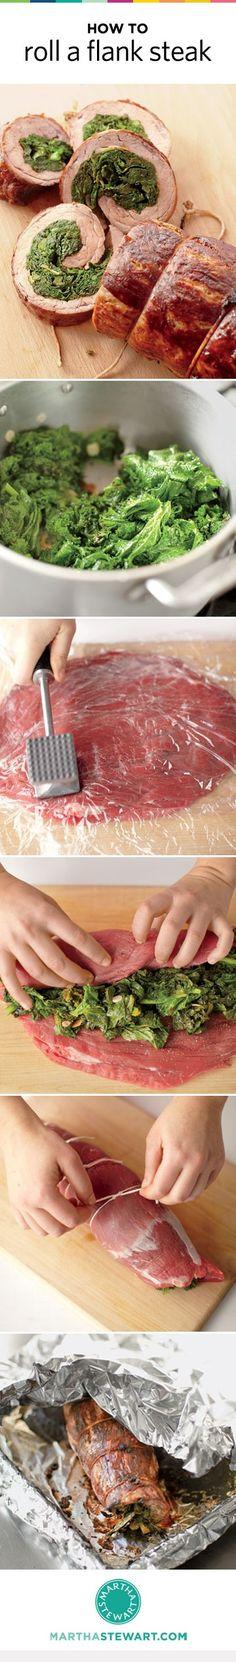 Learn how to make an impressive (but easy) Rolled Stuffed Flank Steak.